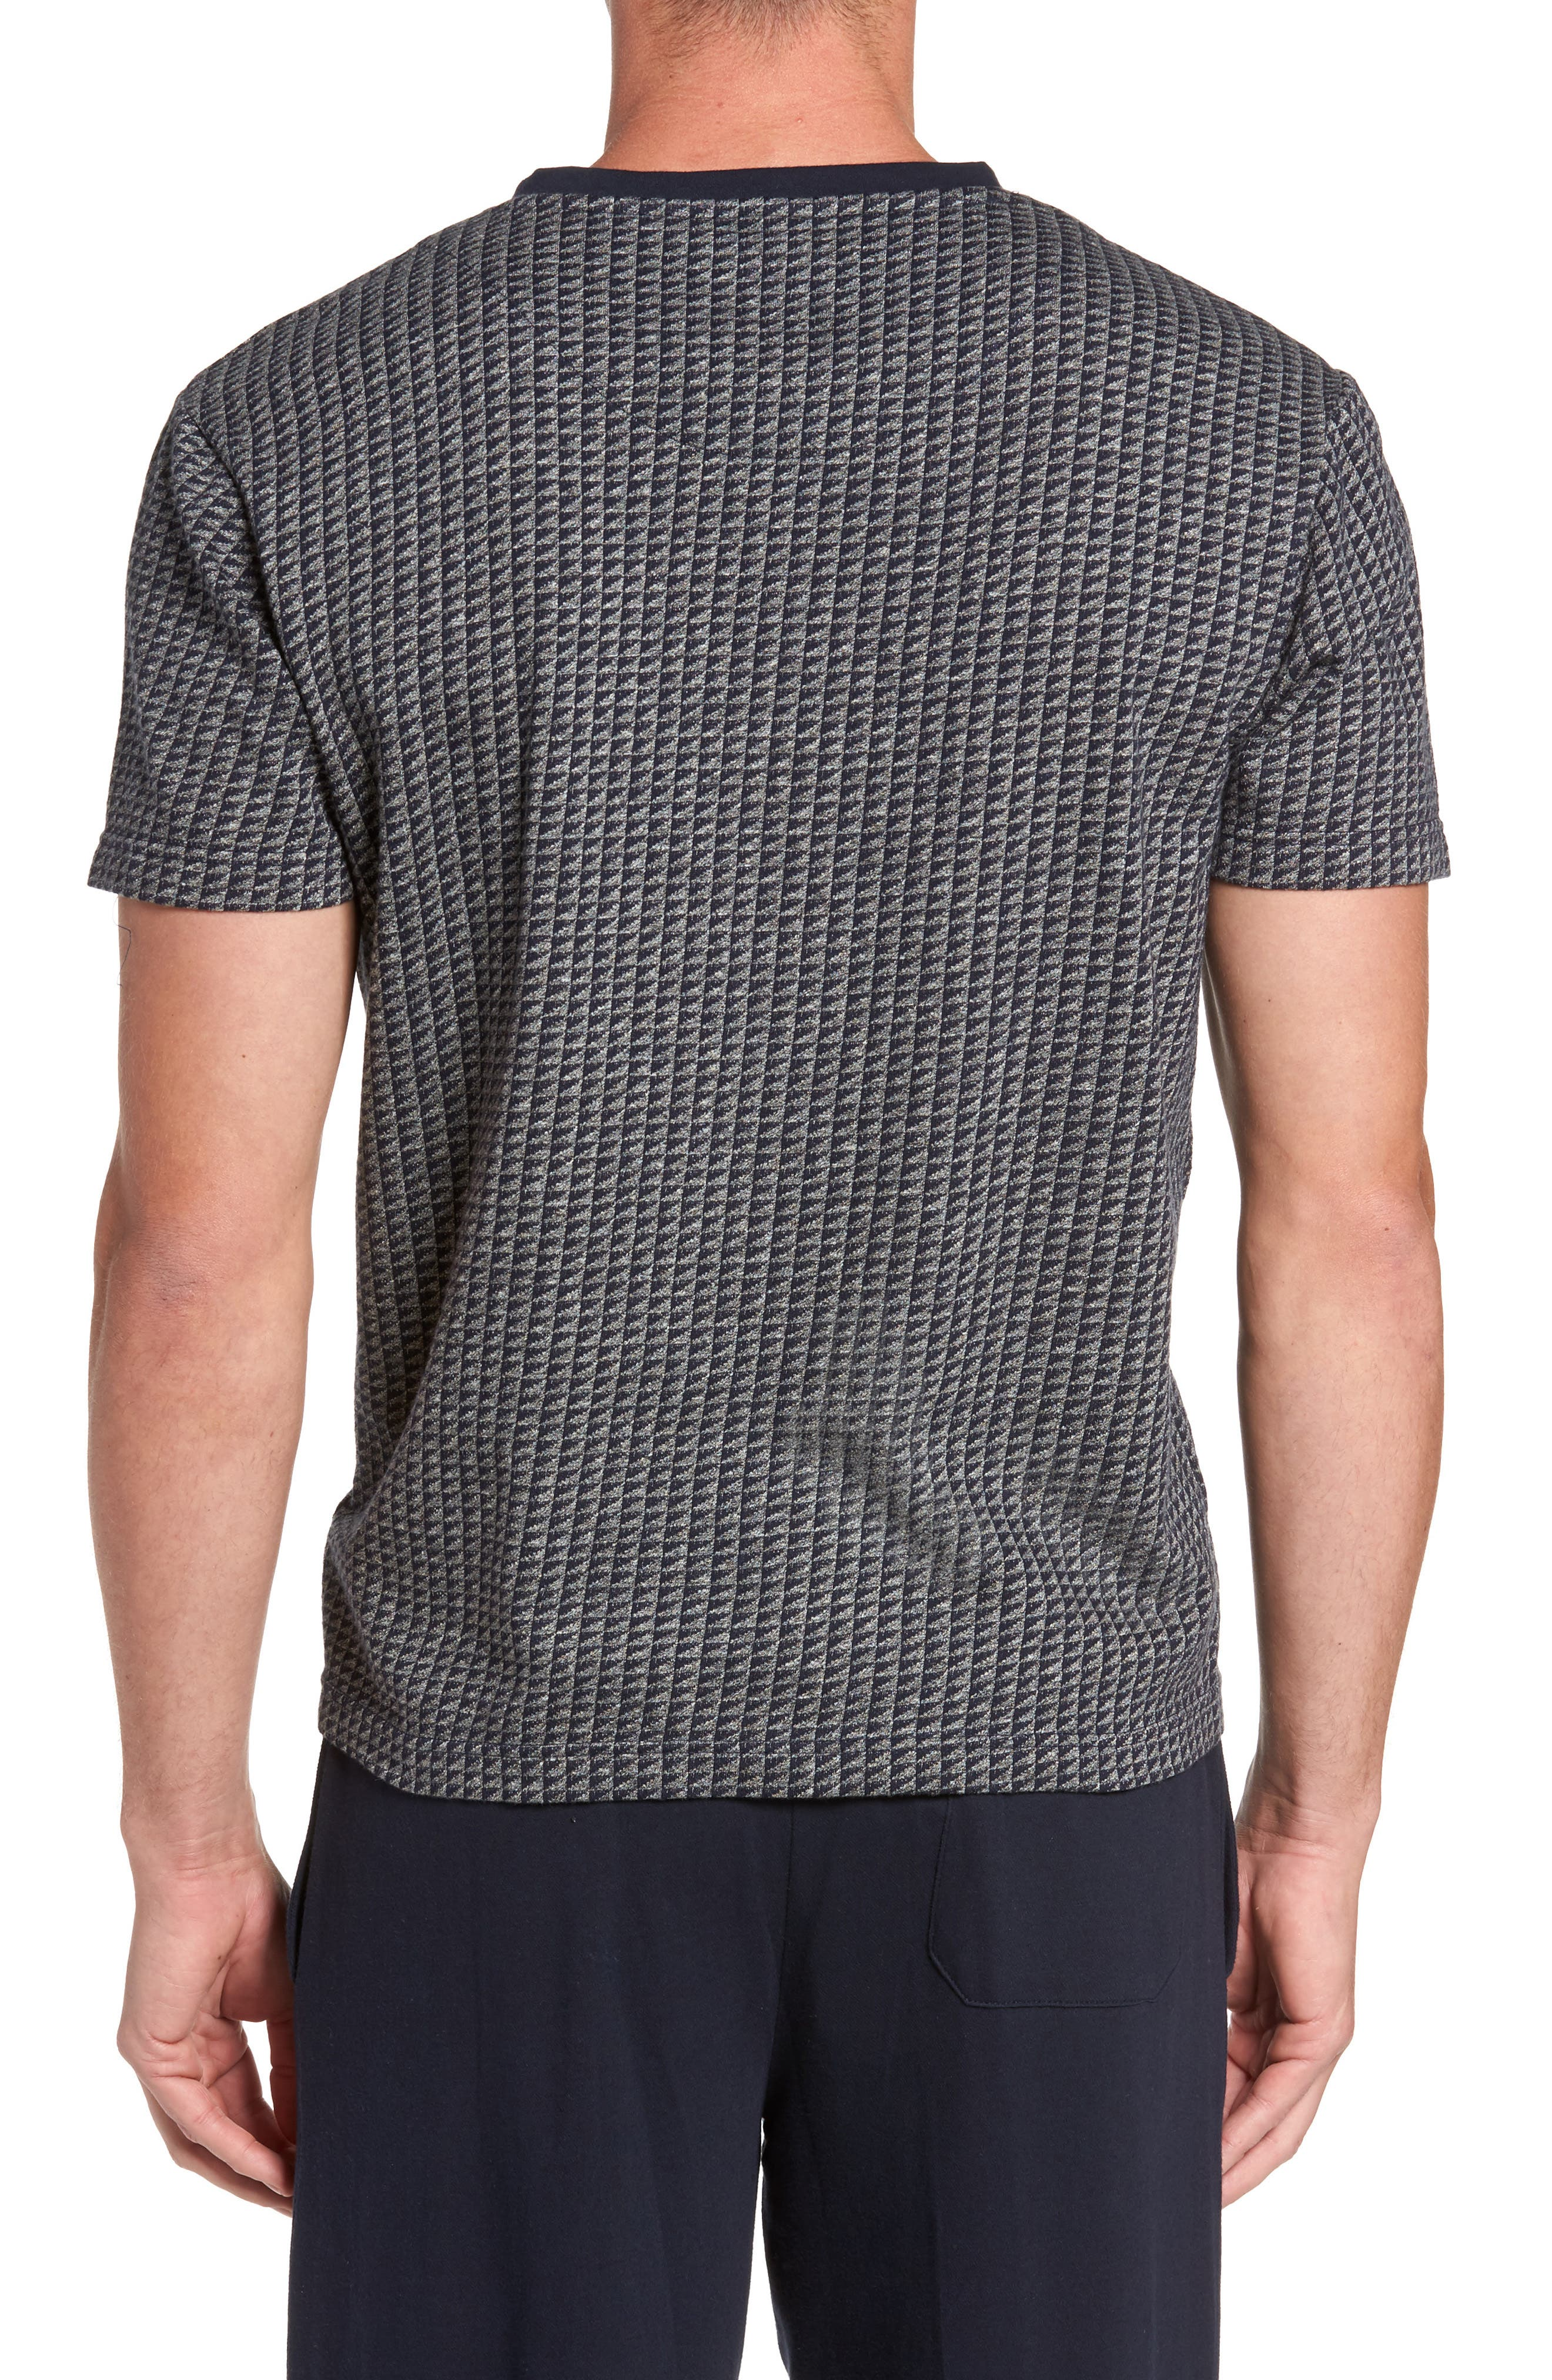 Trey V-Neck T-Shirt,                             Alternate thumbnail 2, color,                             030